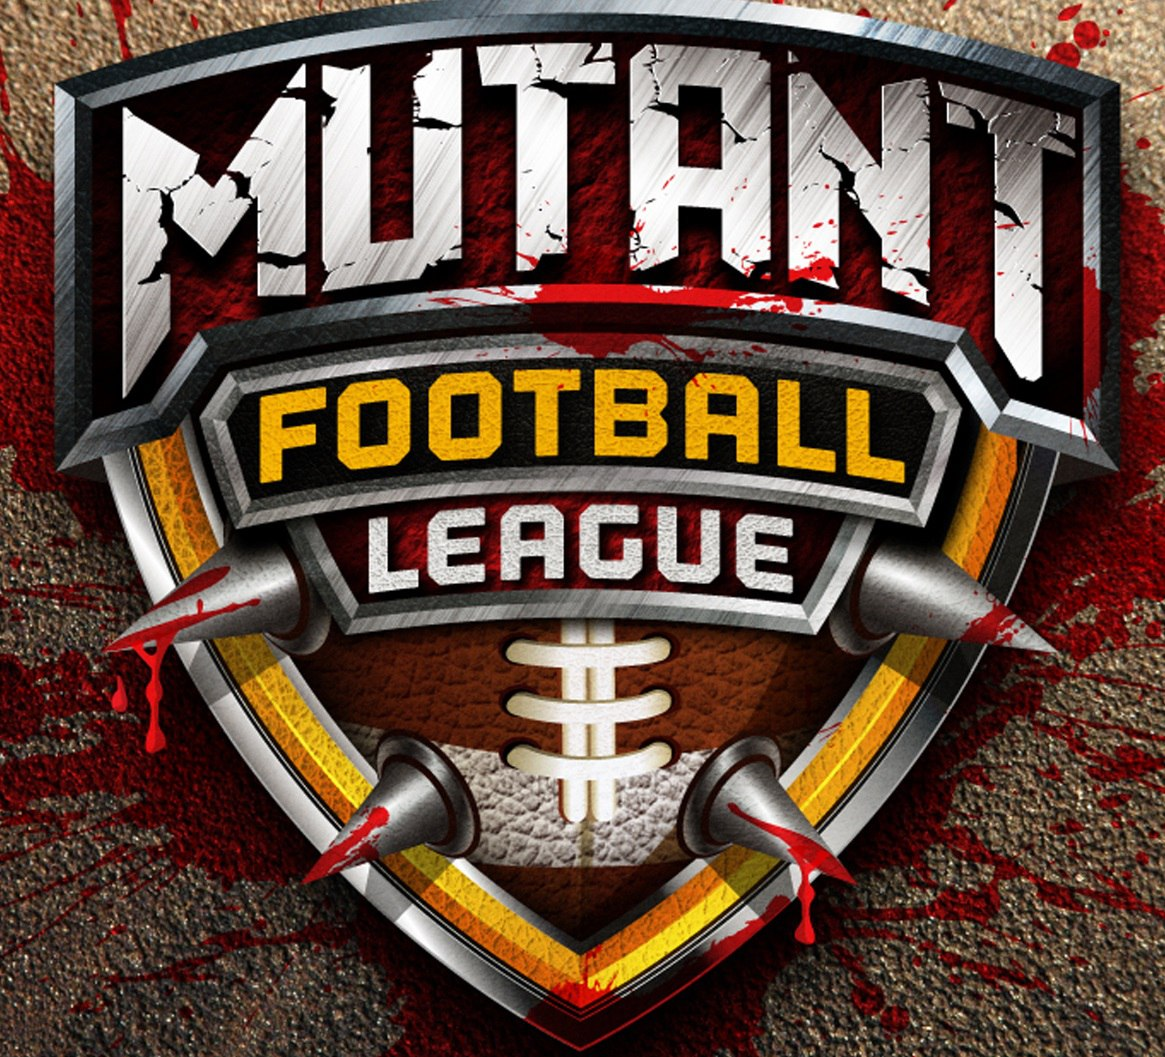 Mutant Football League (Digital Dreams Entertainment LLC) (ENG) [L]